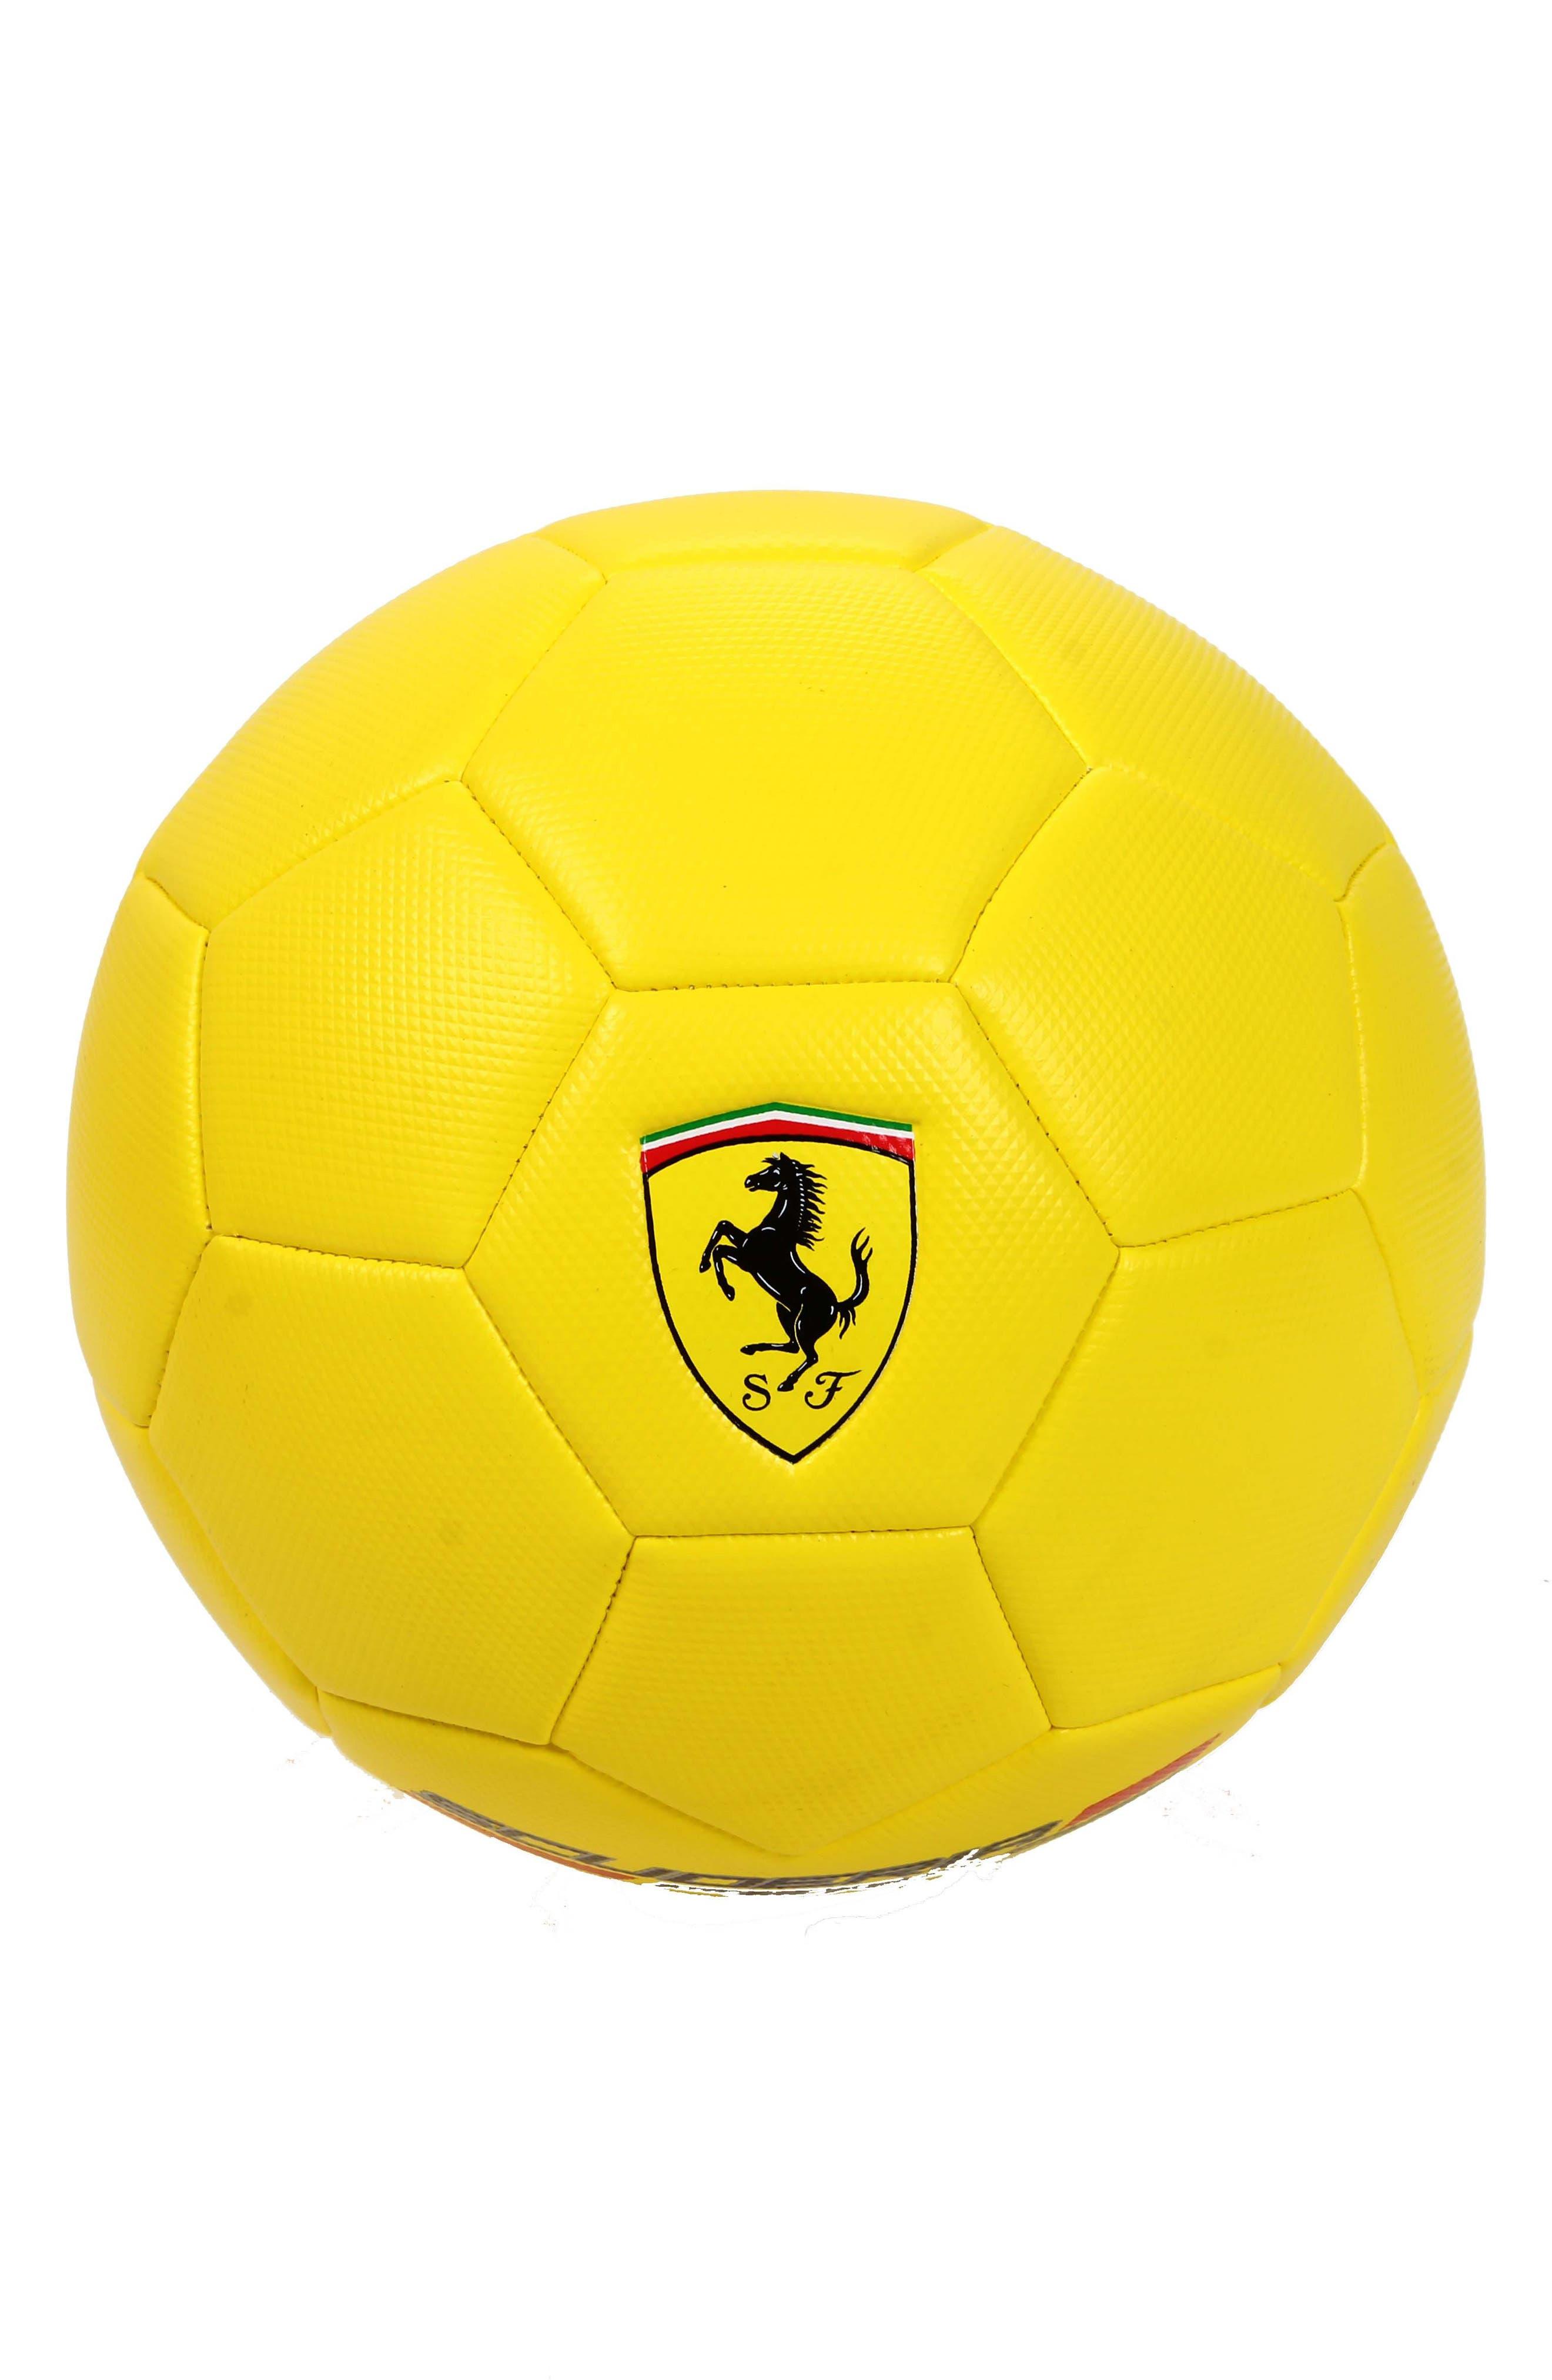 Ferrari Size 5 Soccer Ball